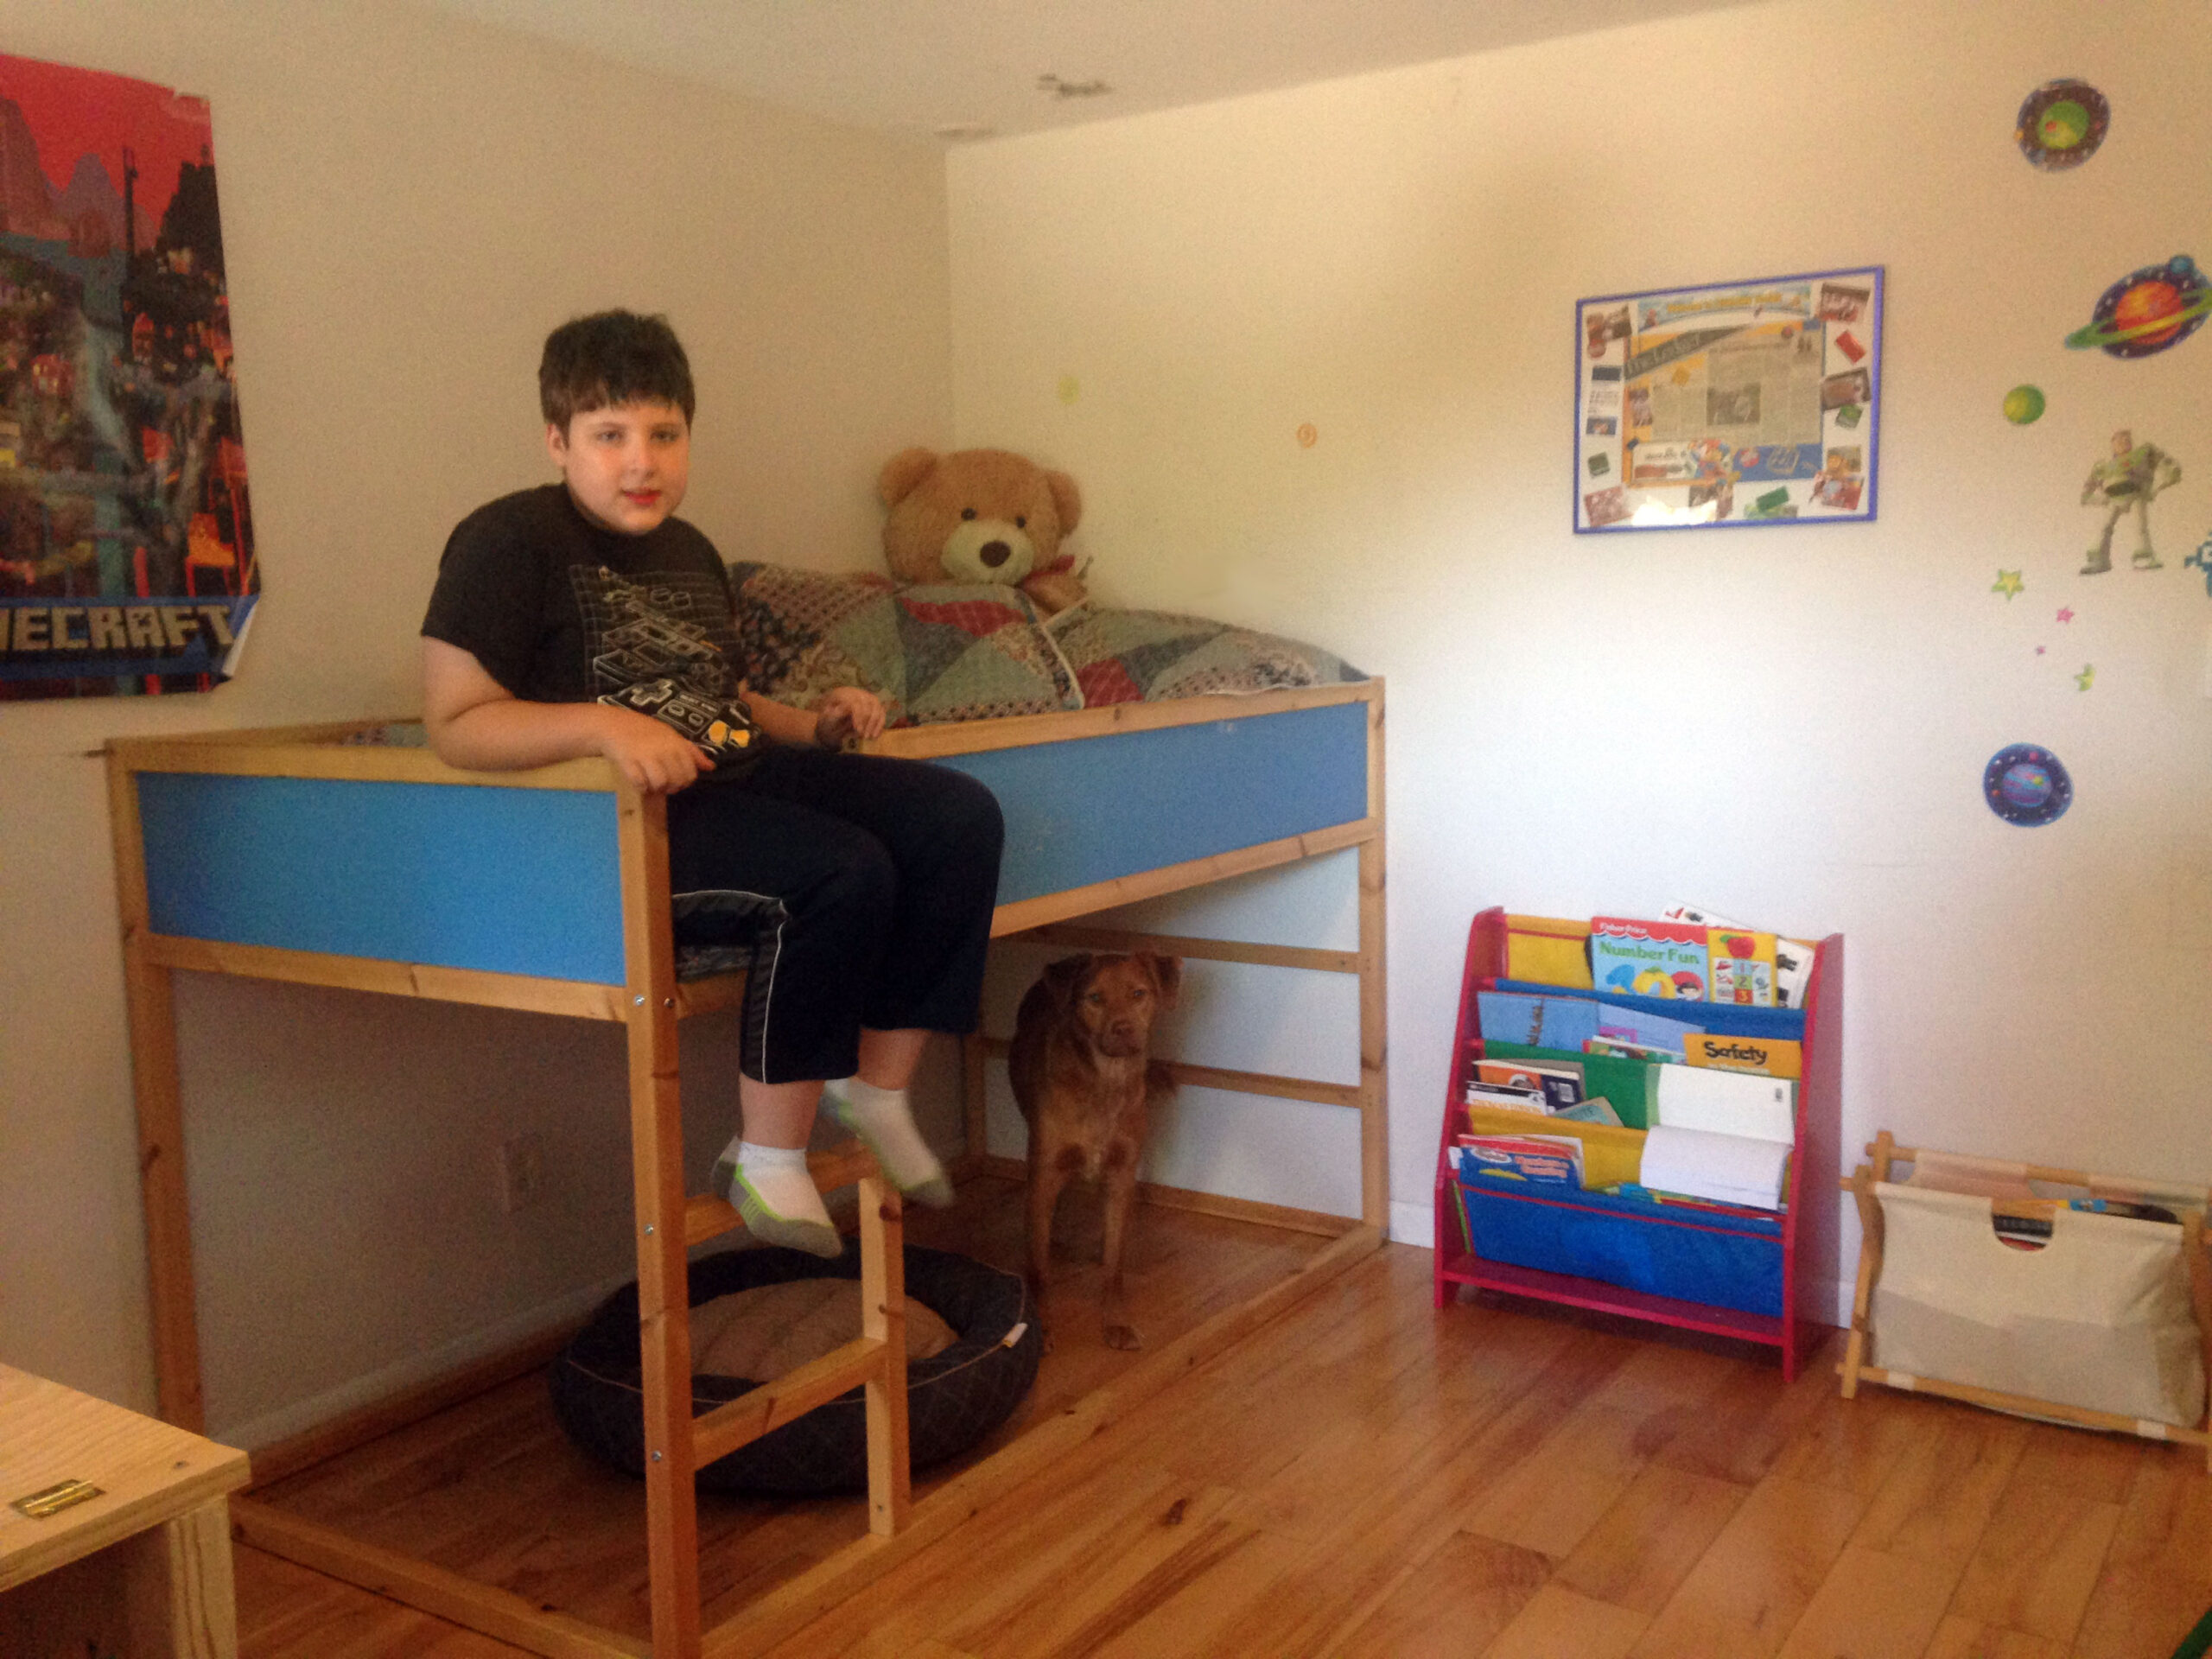 Full Size of Usb Bed Save Money By Hacking An Ikea Kura Jennifer Maker Wohnzimmer Kura Hack